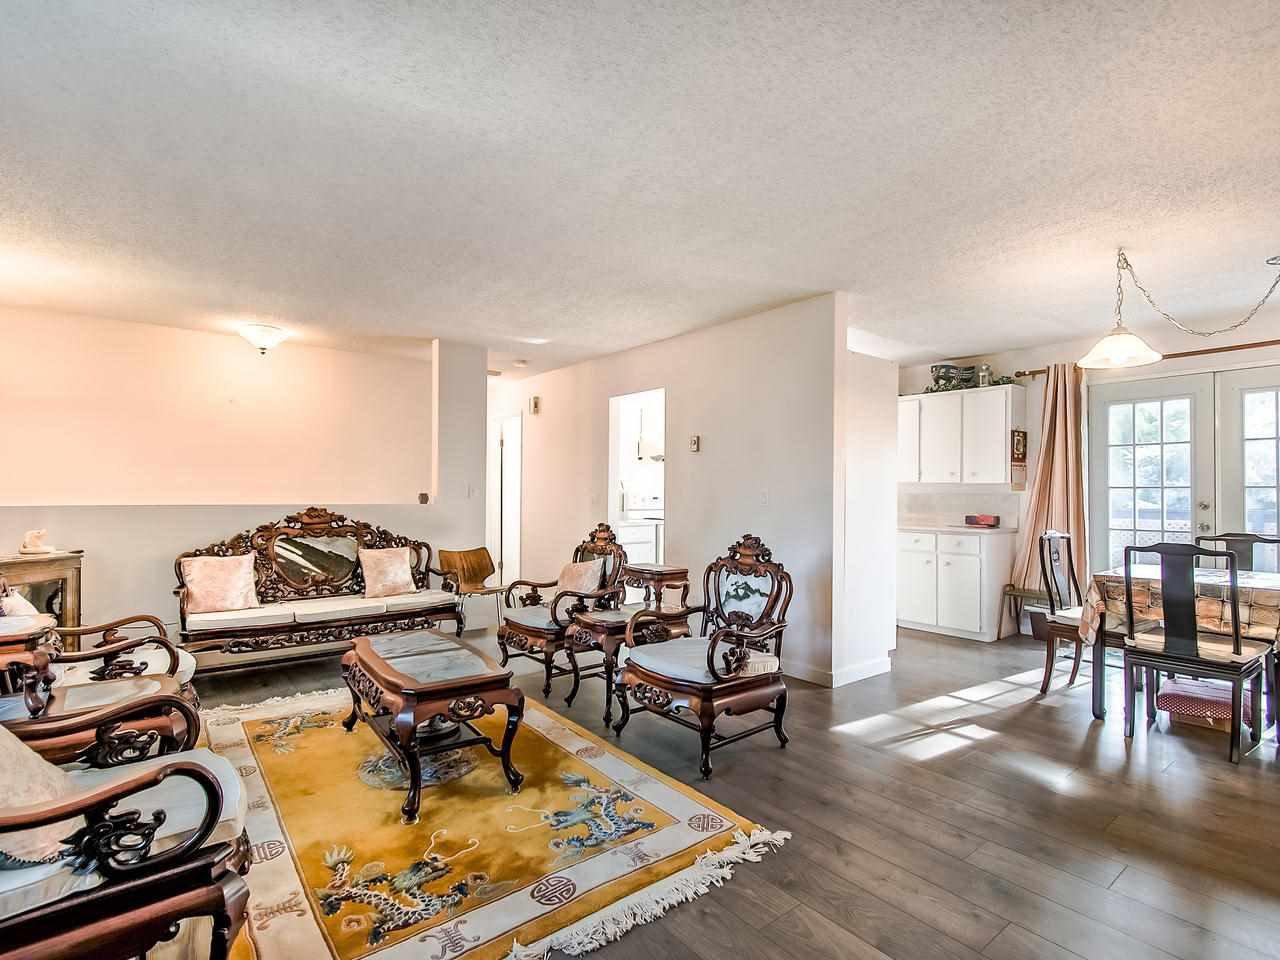 Main Photo: 1564 COQUITLAM Avenue in Port Coquitlam: Glenwood PQ House for sale : MLS®# R2414807